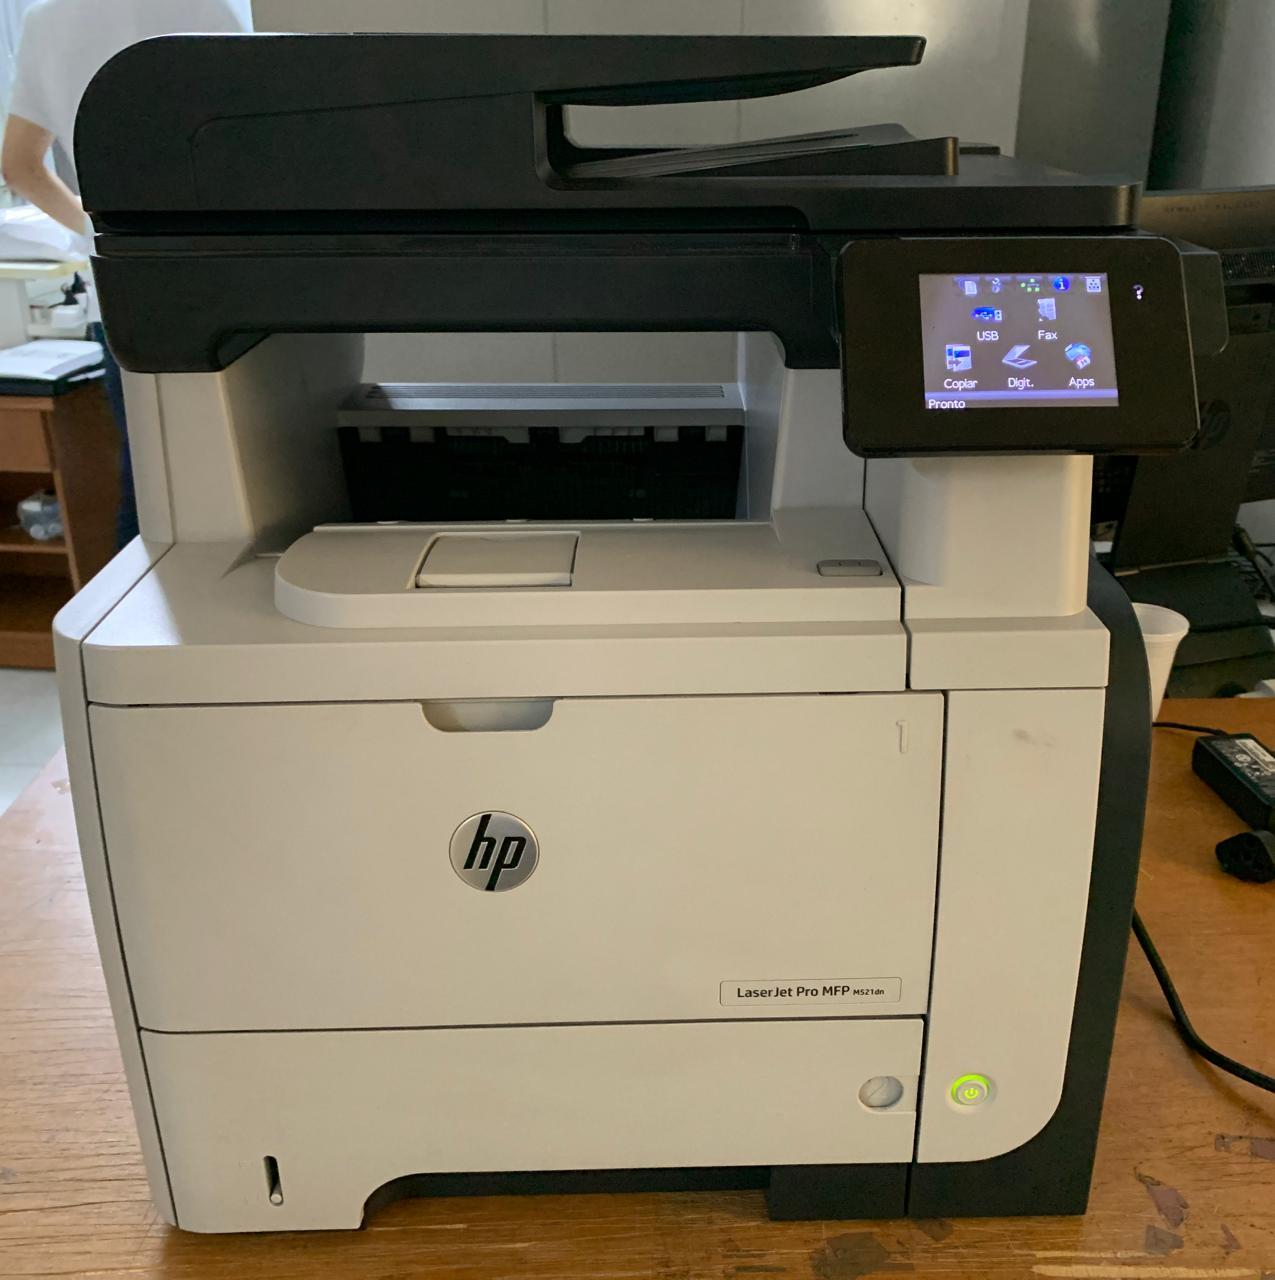 Impressora HP LaserJet Pro MFP M521dn - Multifuncional Laser Monocromática - Não enviamos